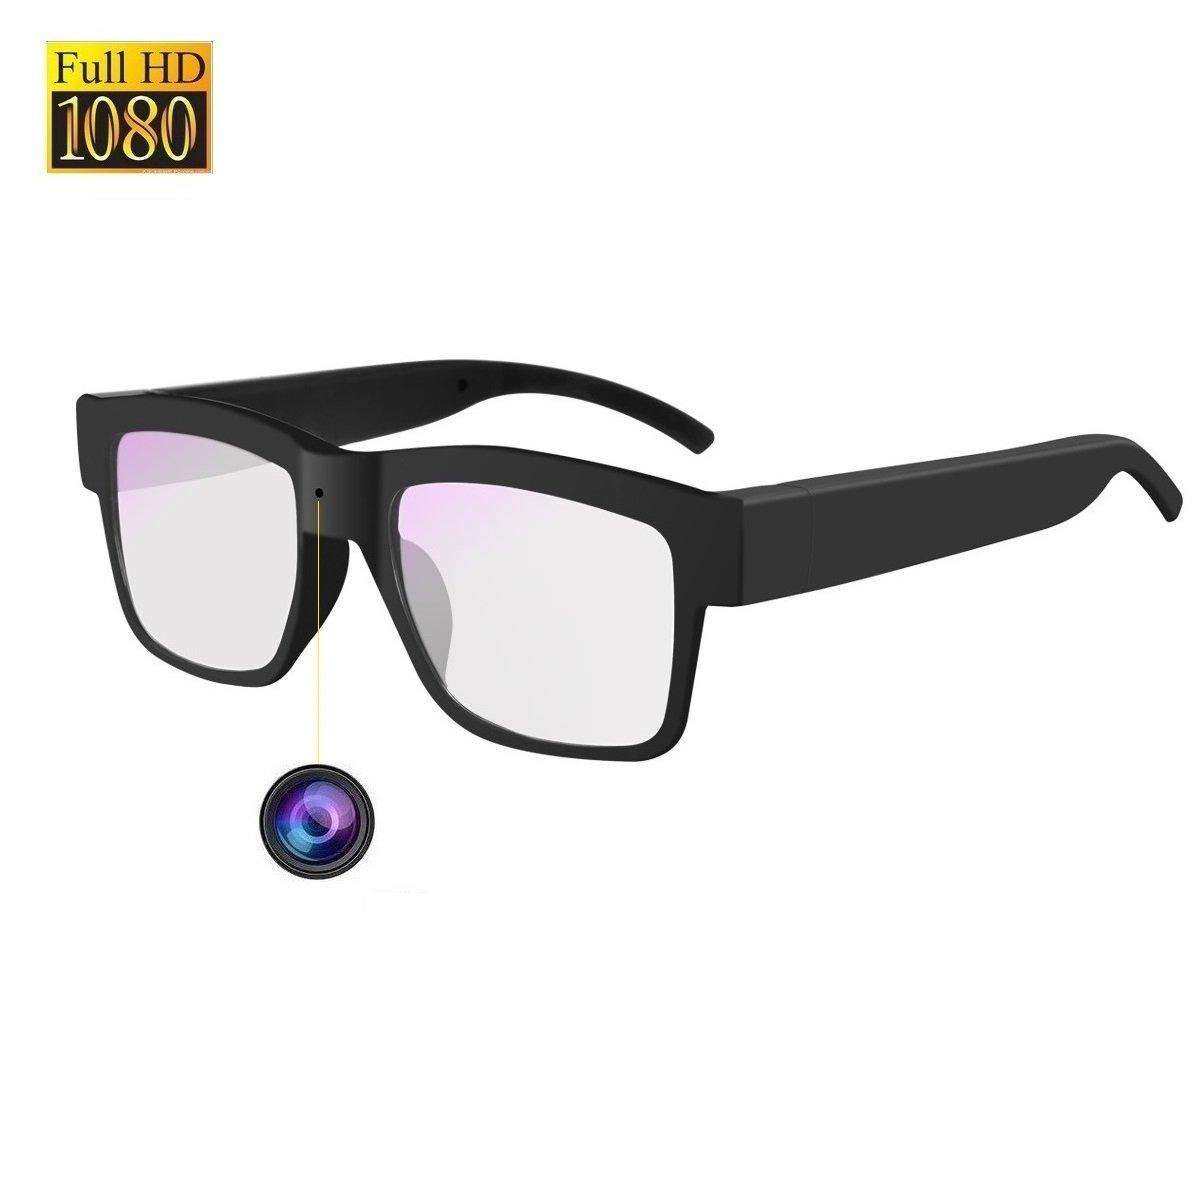 Camera Glasses HD 1080P Towero Wearable Hidden Camera Glasses